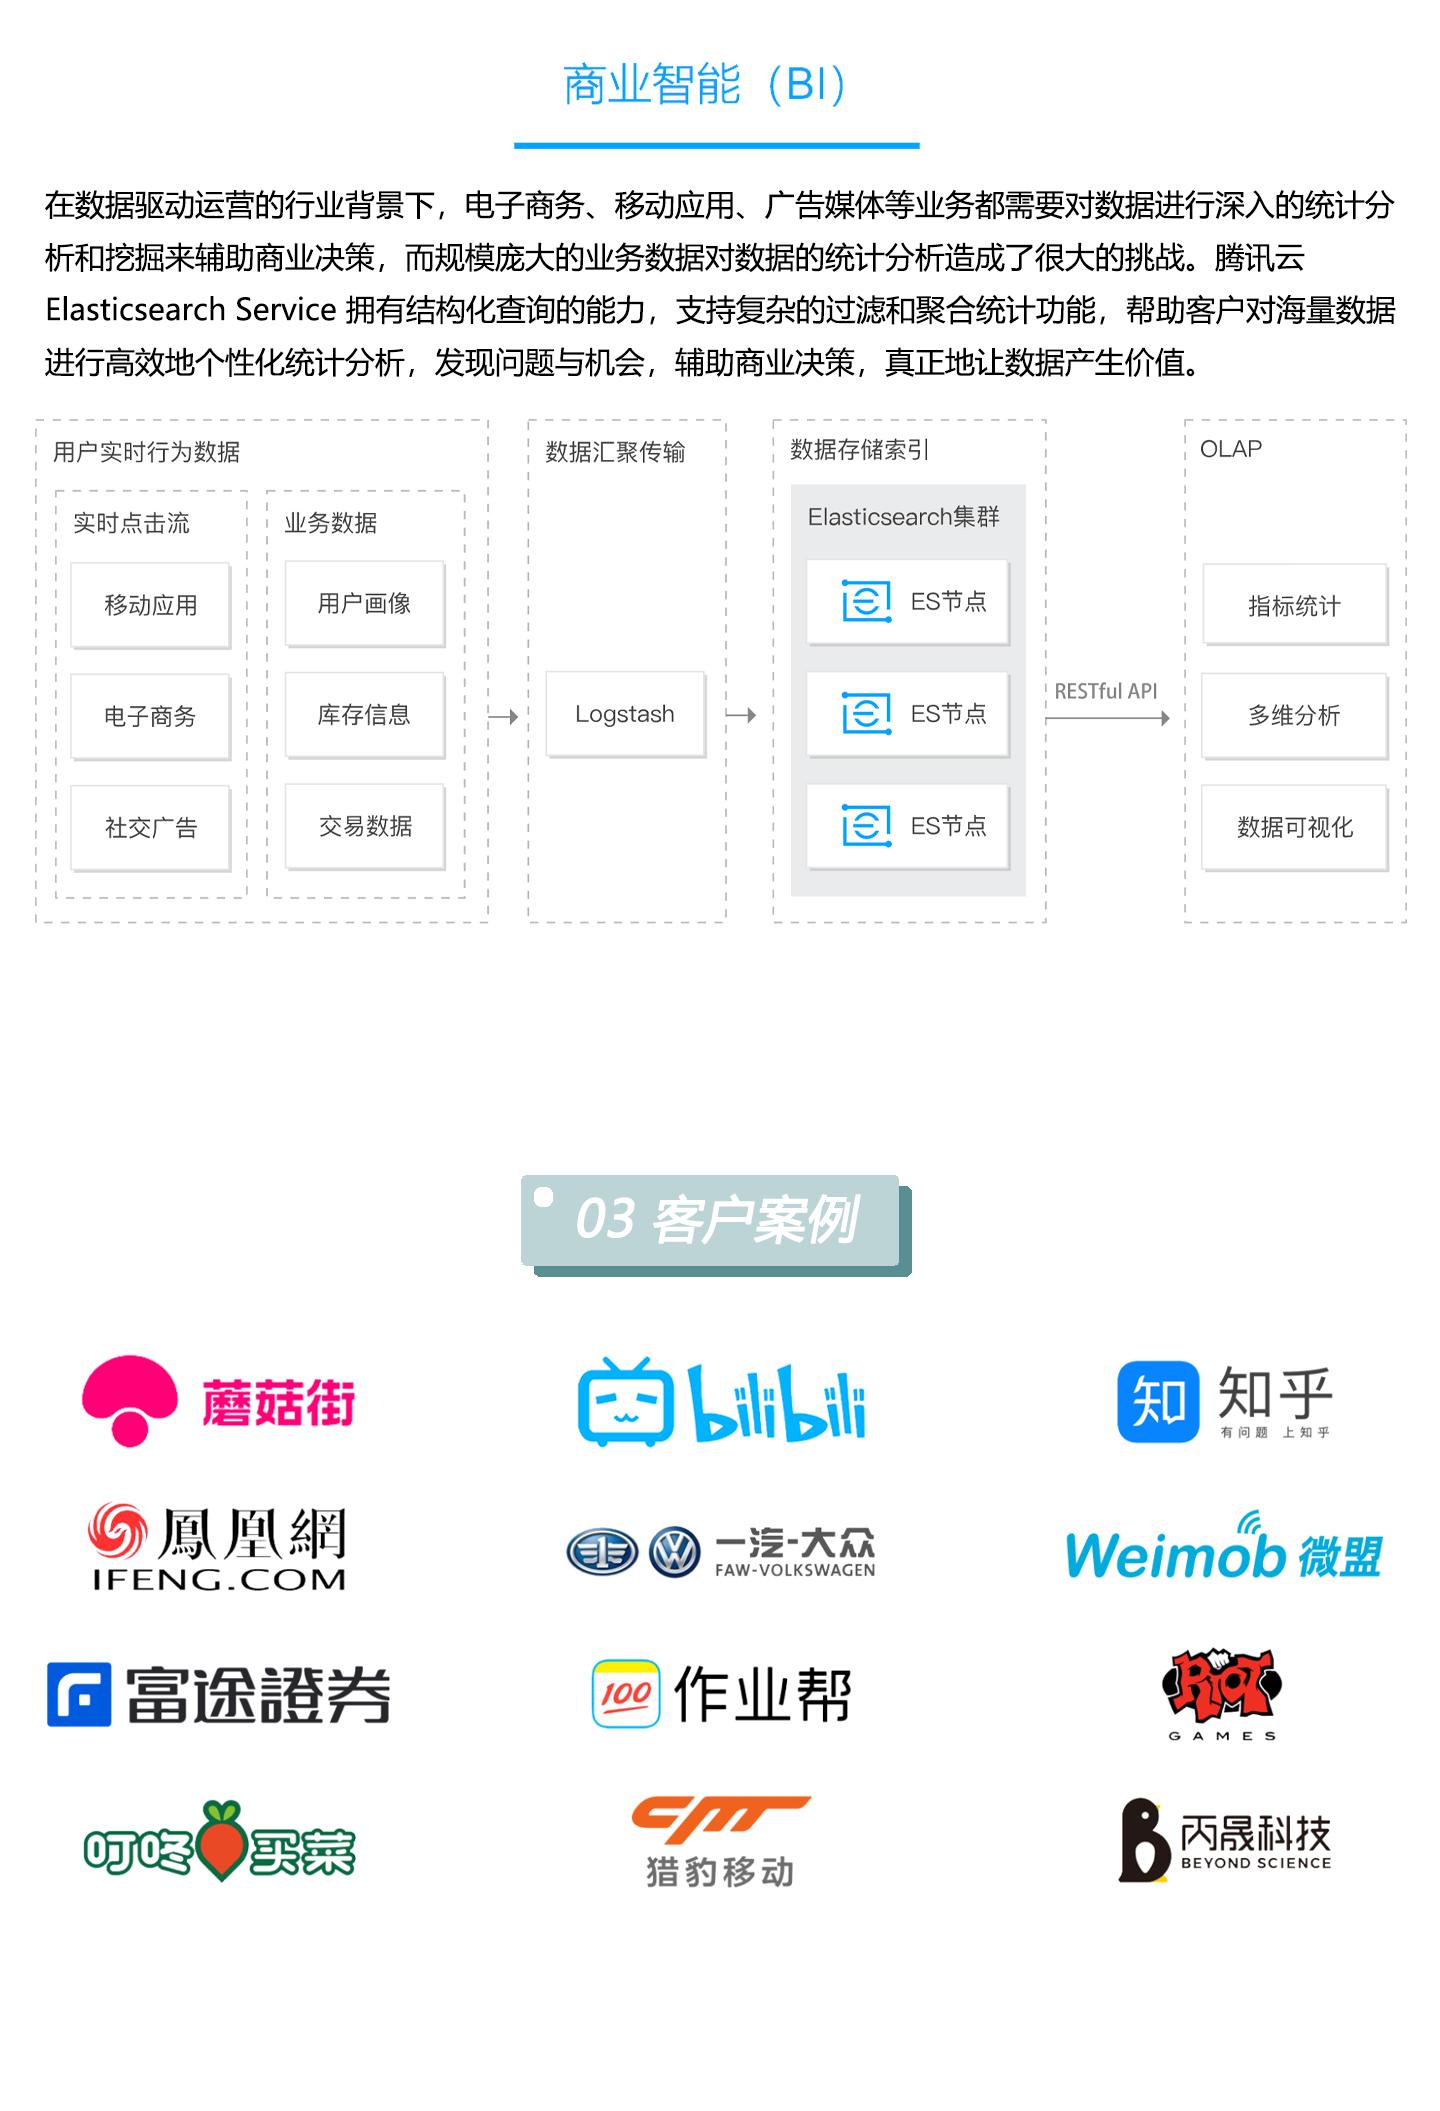 Elasticsearch-Service-1440_04.jpg